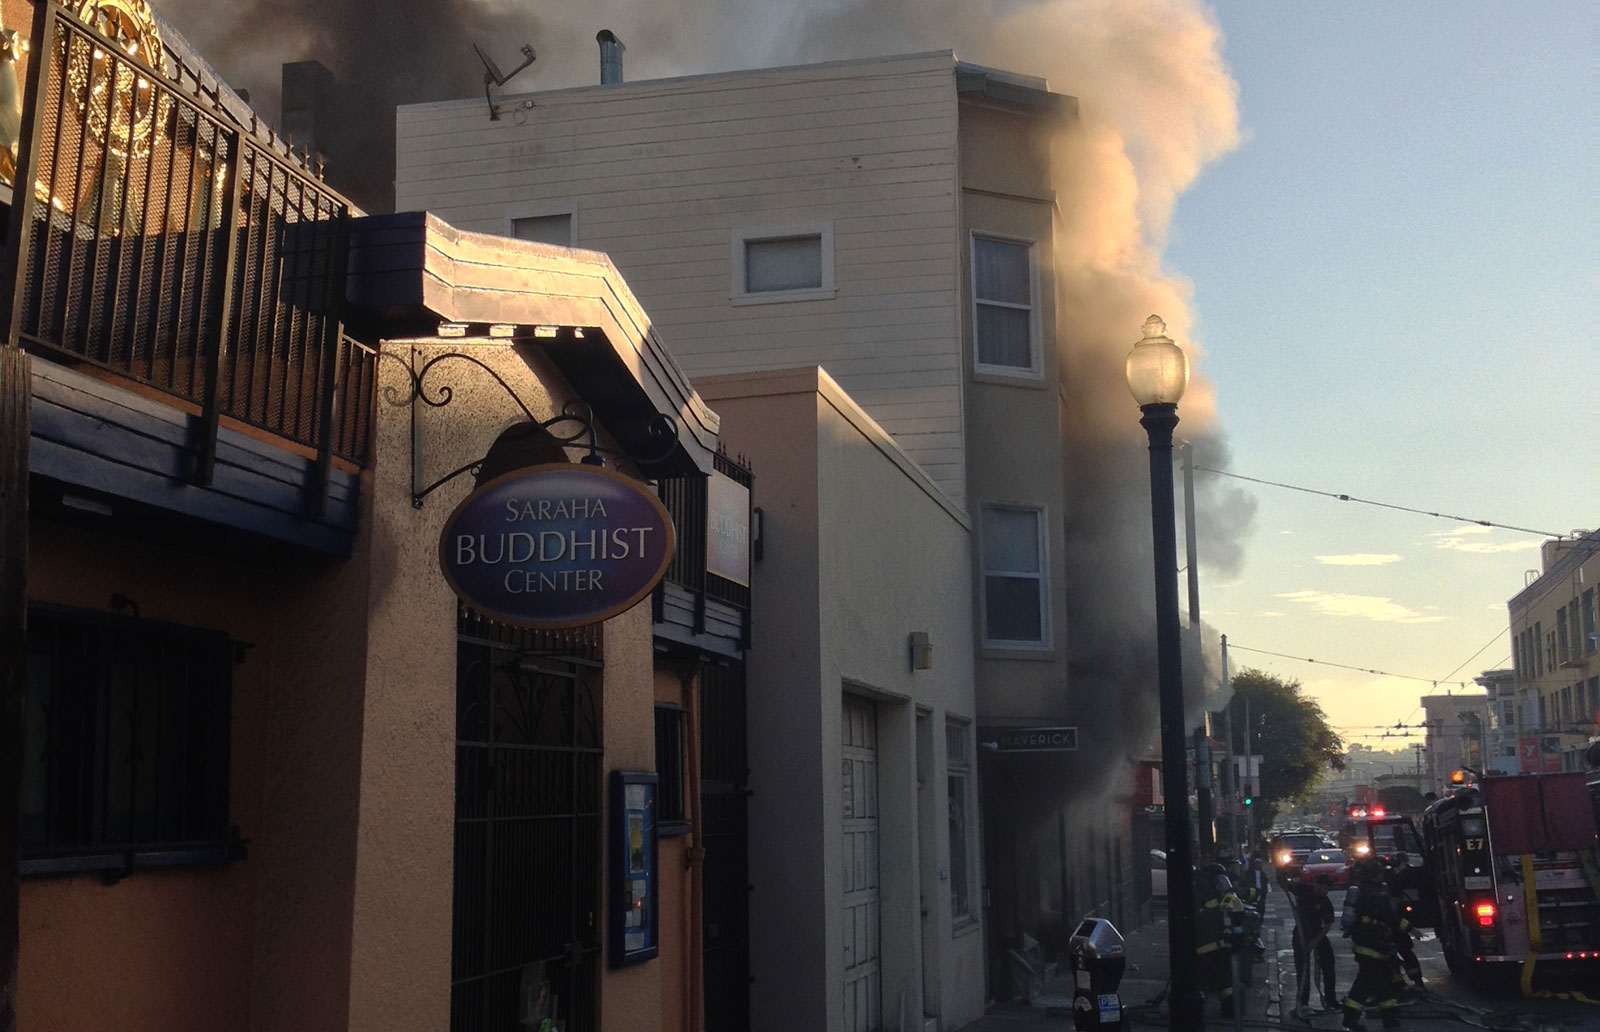 Maverick Restaurant Ablaze in Mission Fire